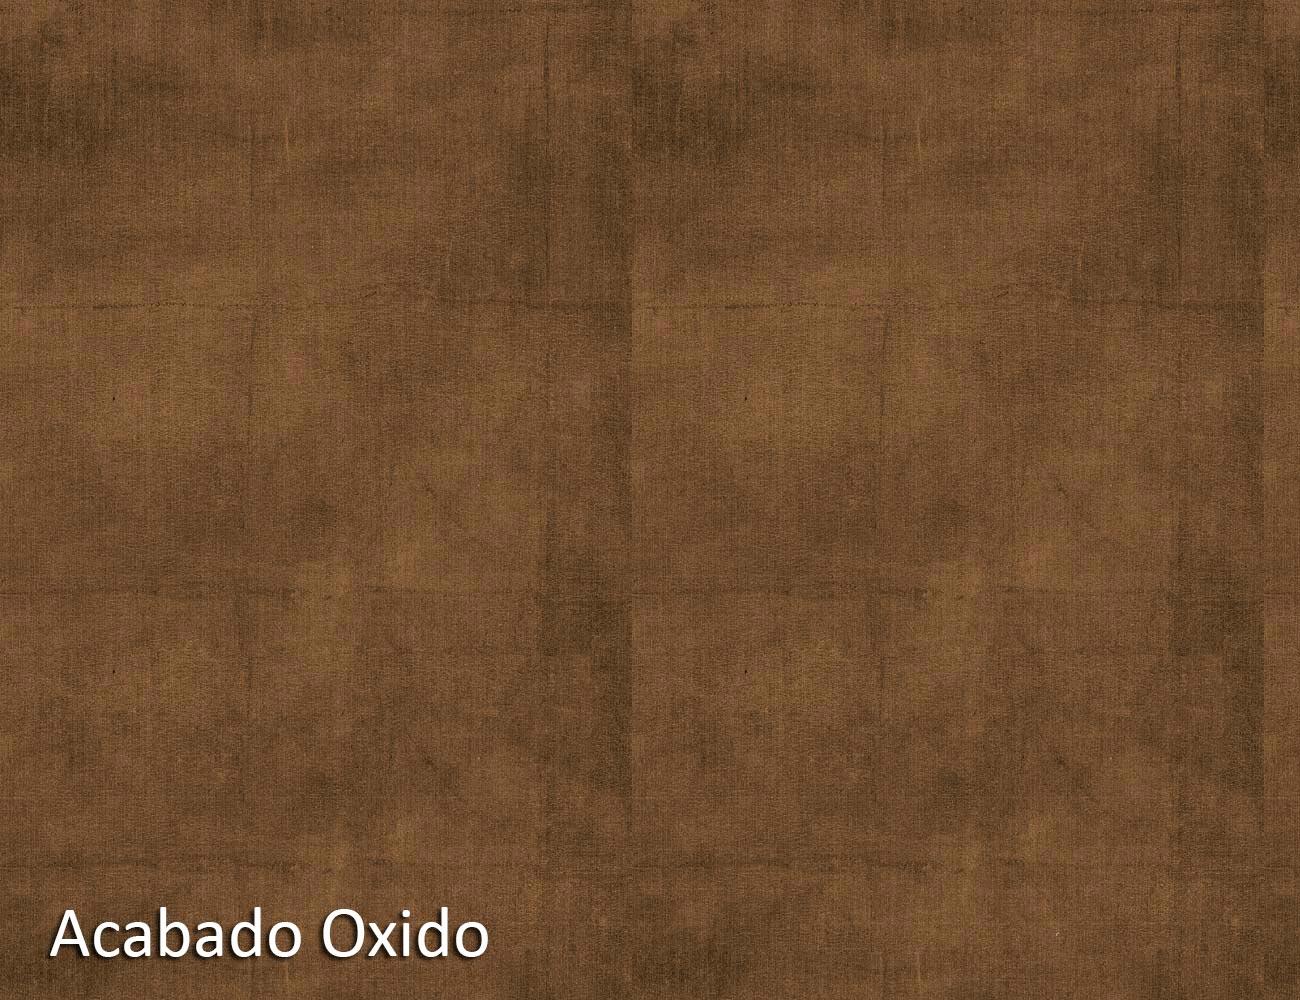 Acabado oxido4